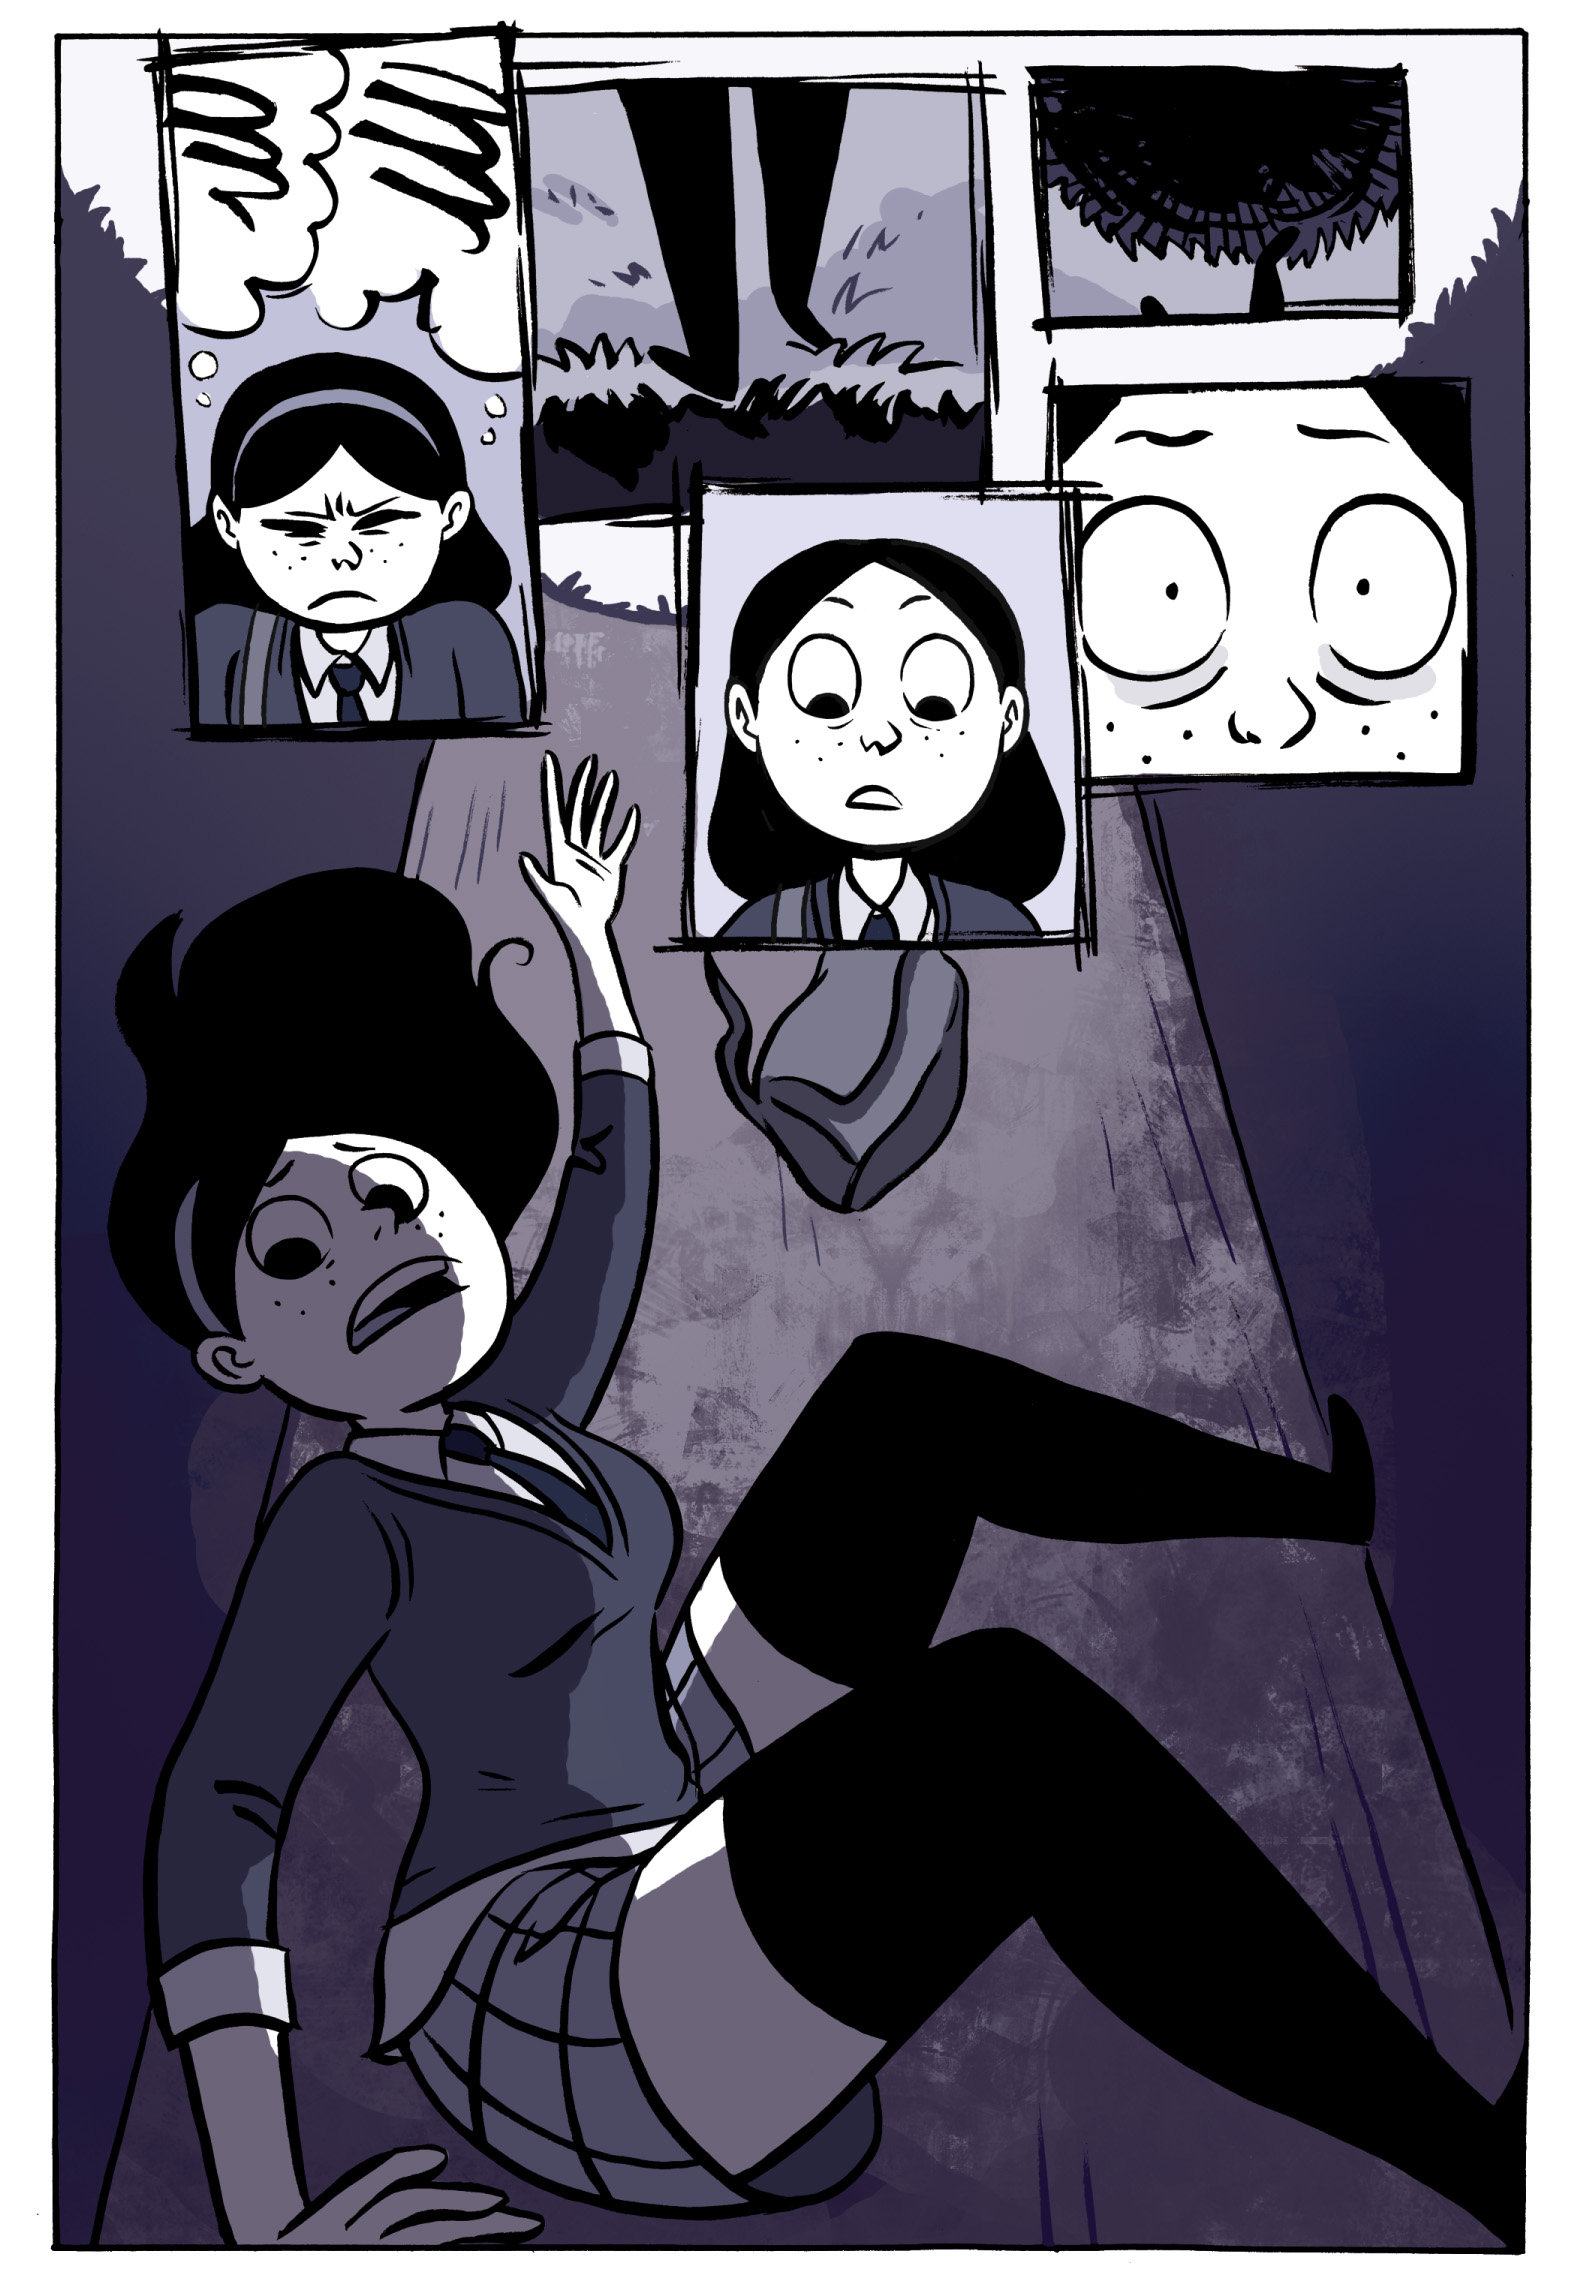 Anya's Ghost: Vera Brosgol: 9781596435520: Amazon.com: Books